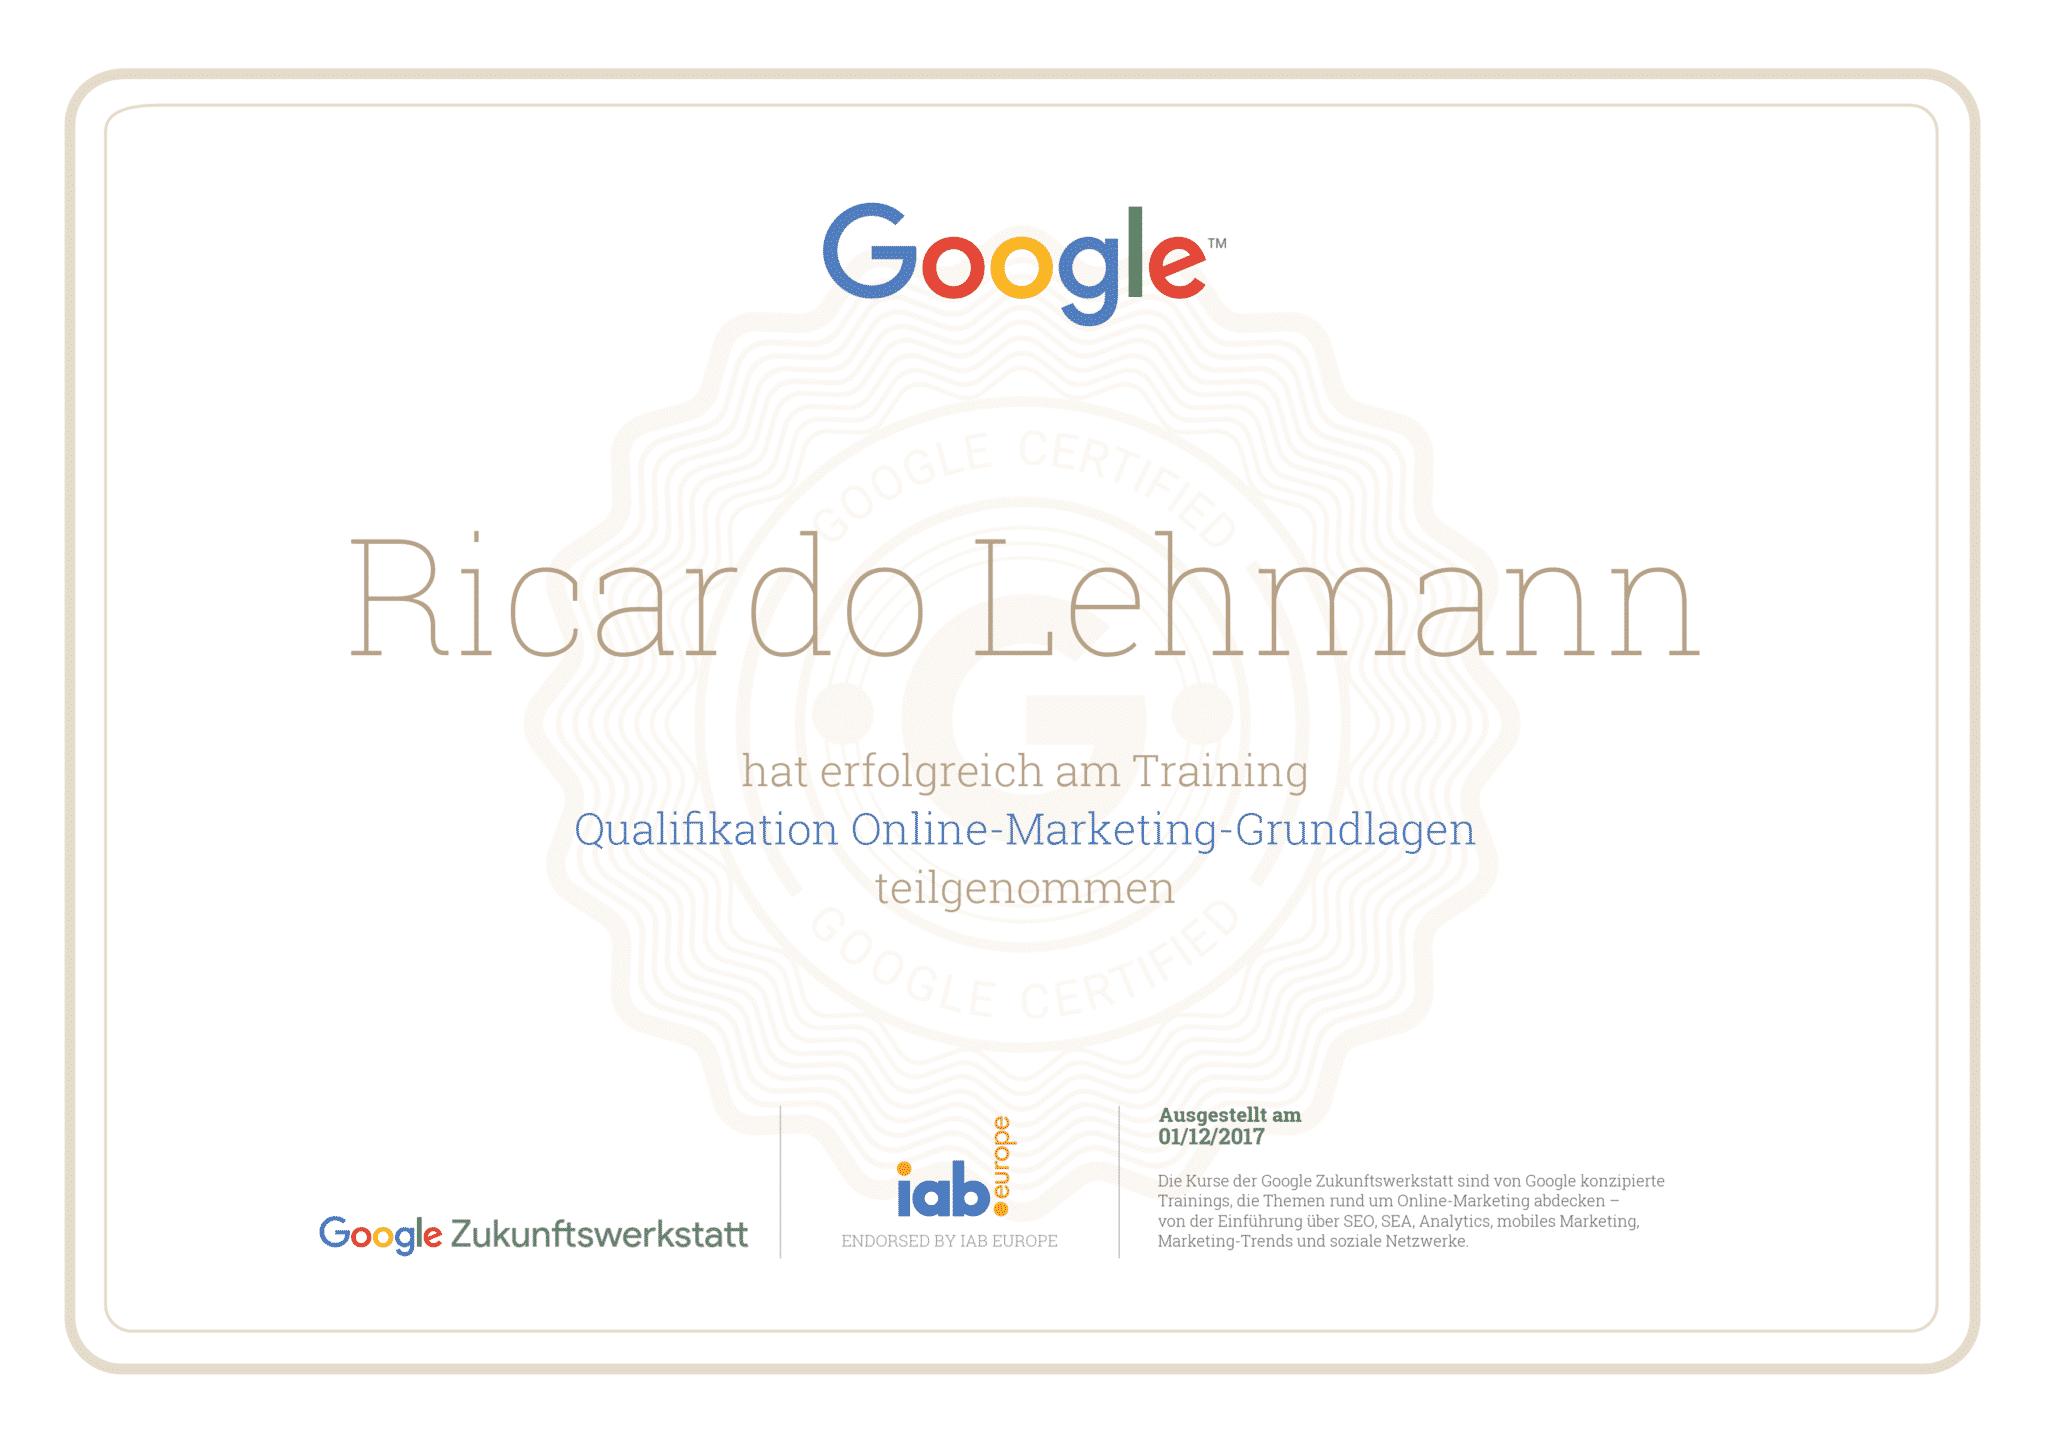 Google - Zukunftswerkstatt - Zertifikat